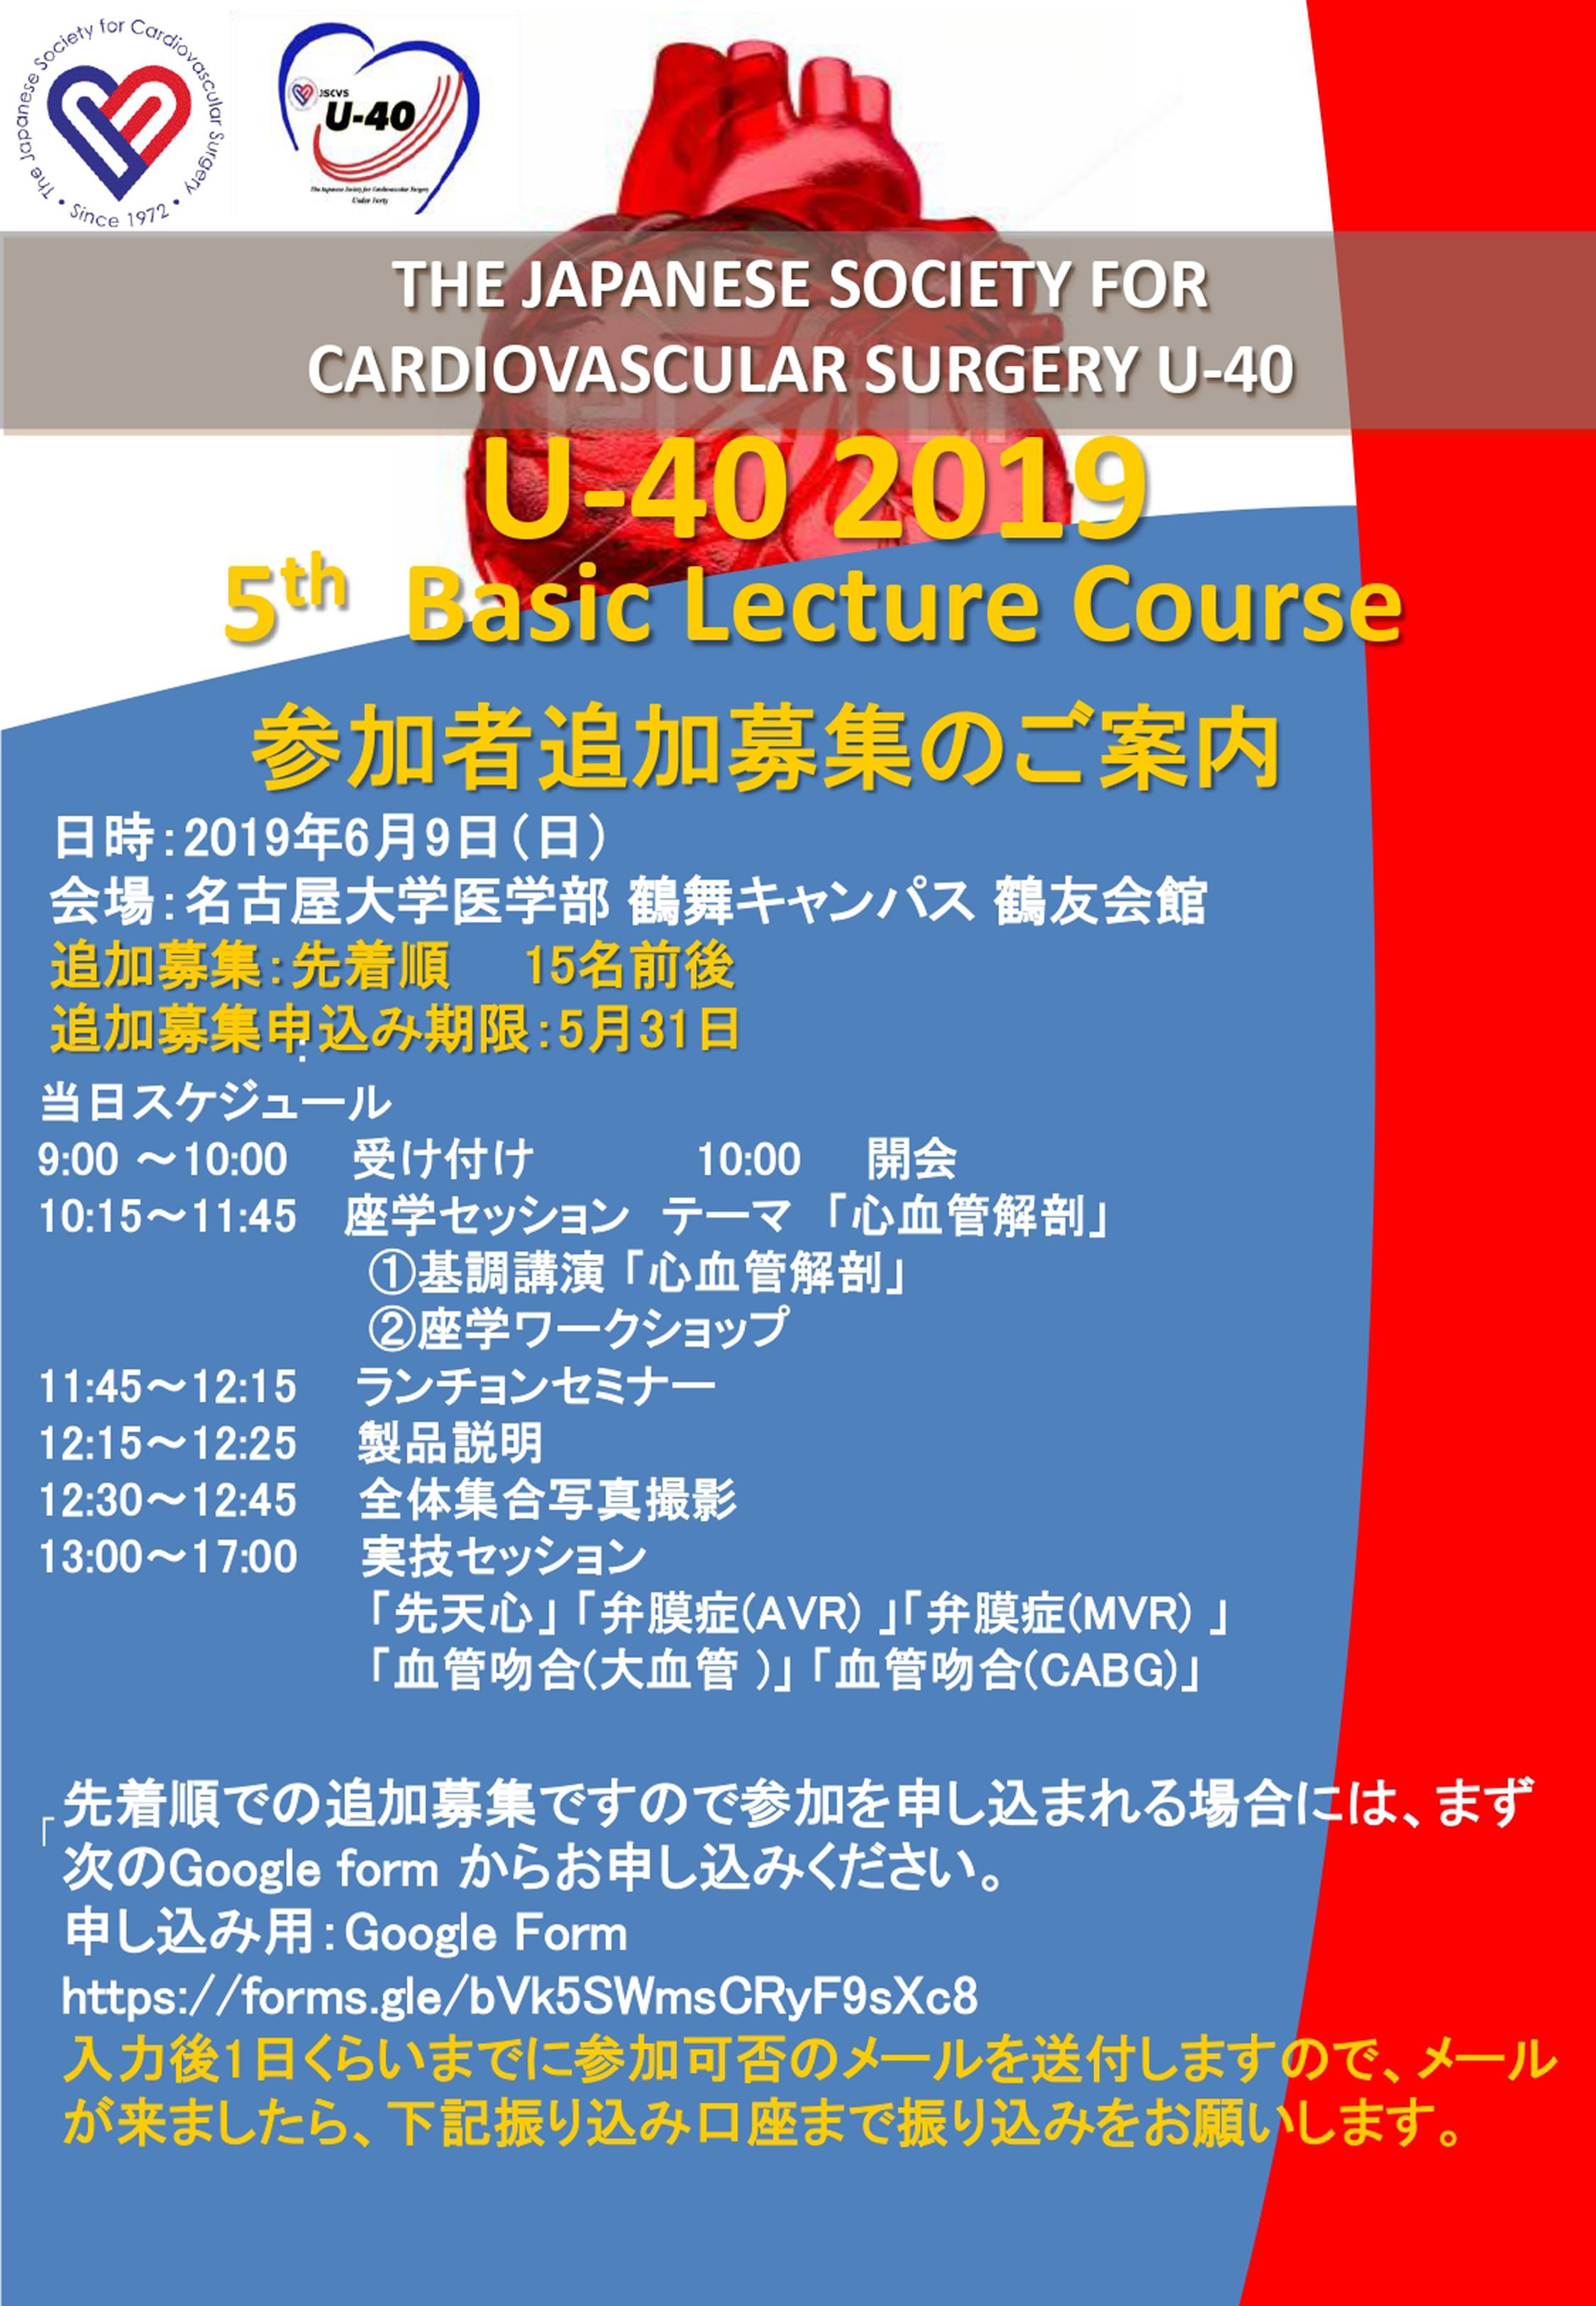 U-40中部支部 Basic Lecture Course